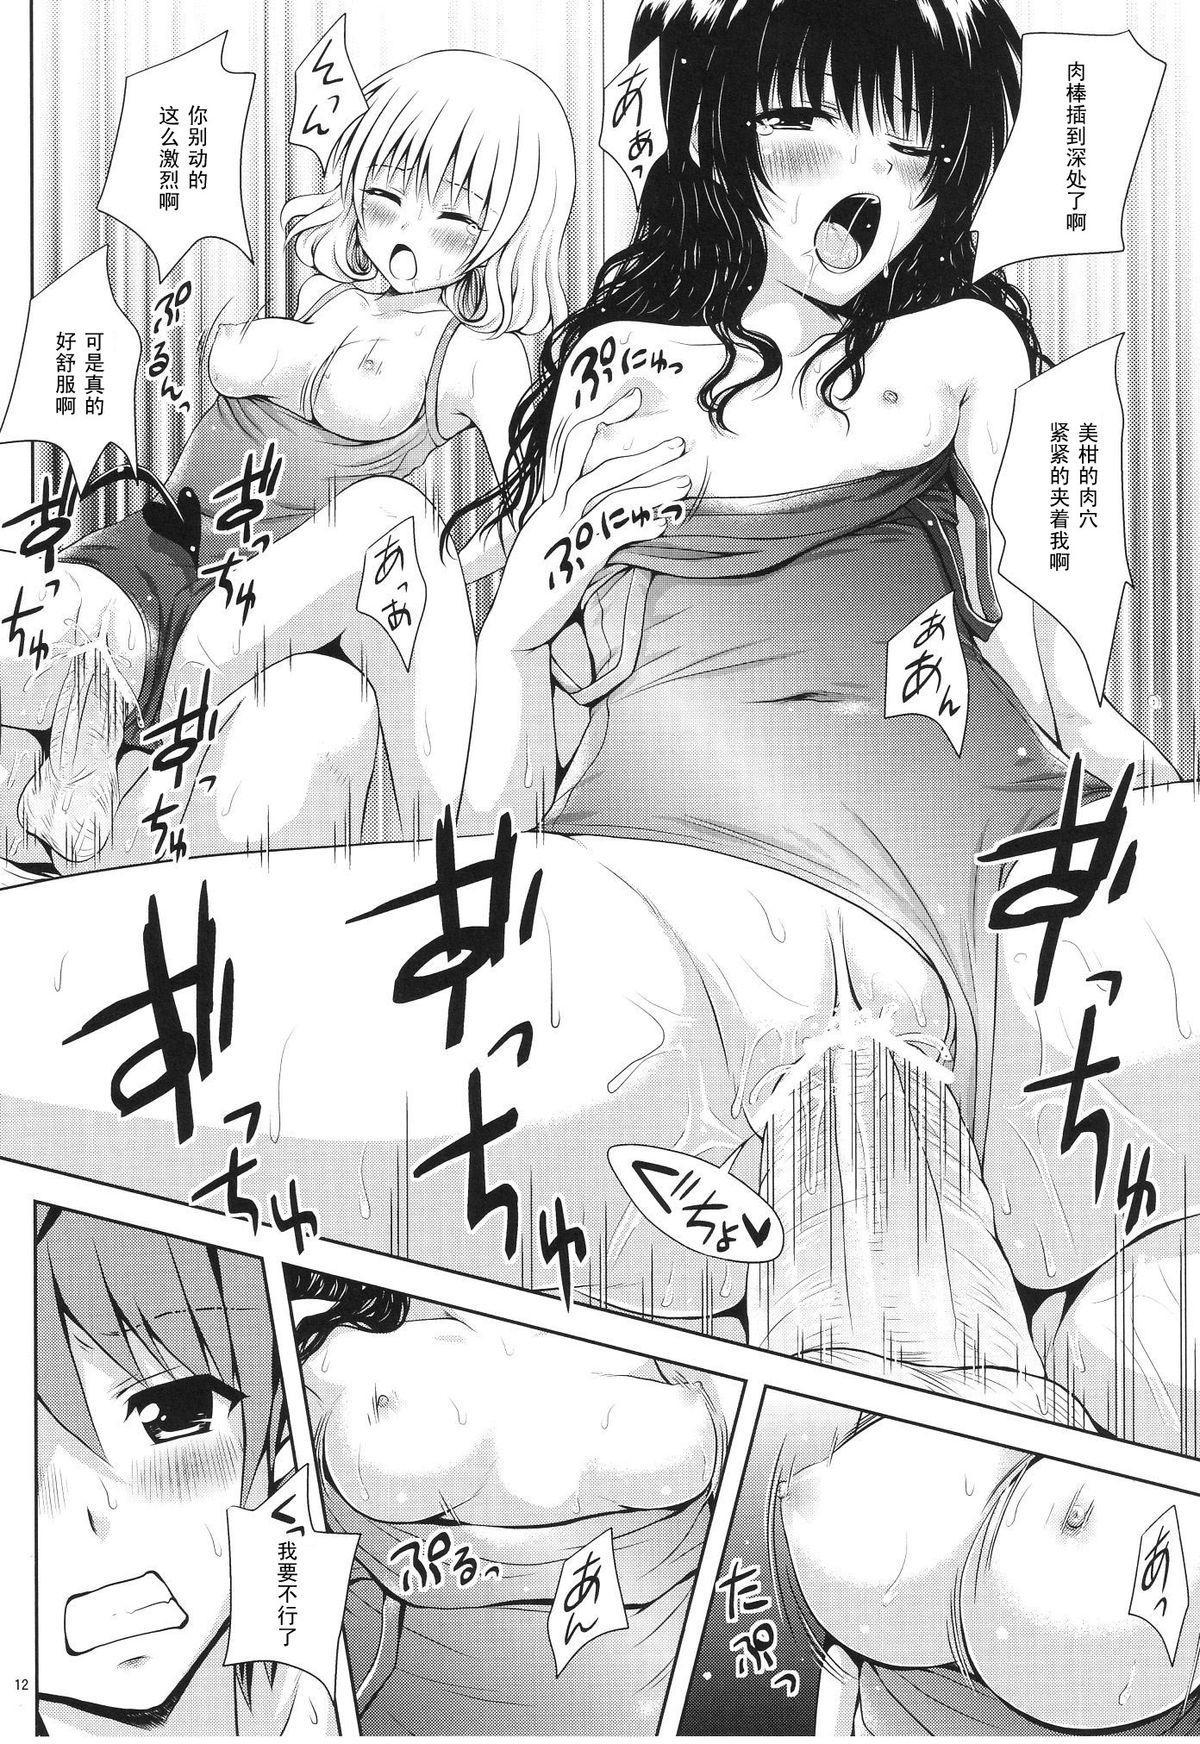 Momo ☆ Mikan 10